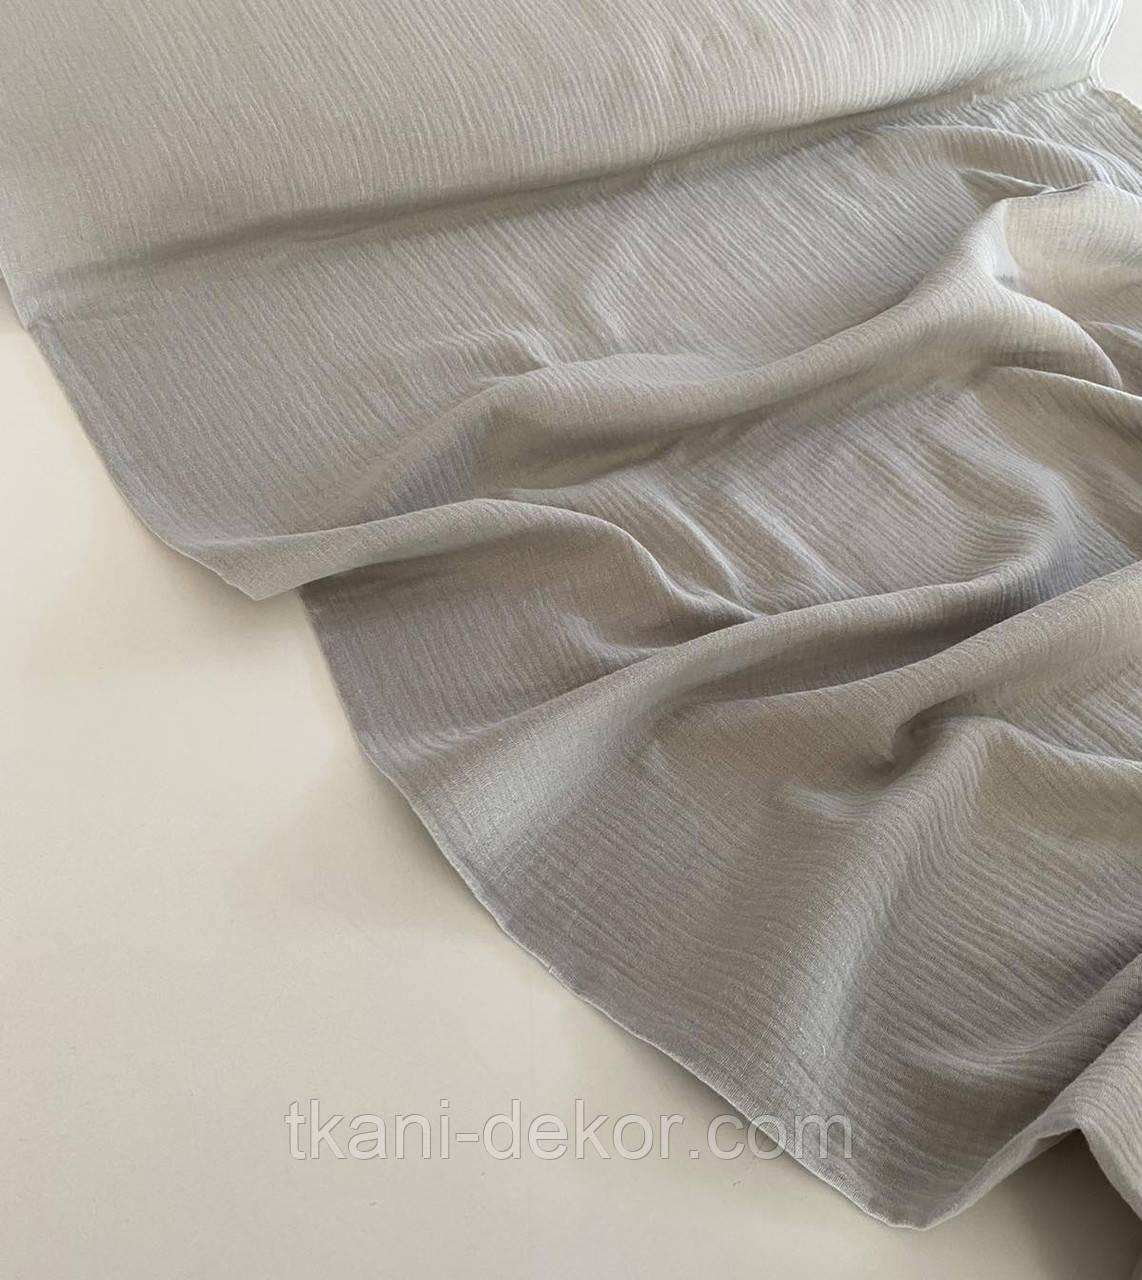 Муслин (хлопковая ткань) жатка светло-серый однотон (ширина 1,35 м) (9)